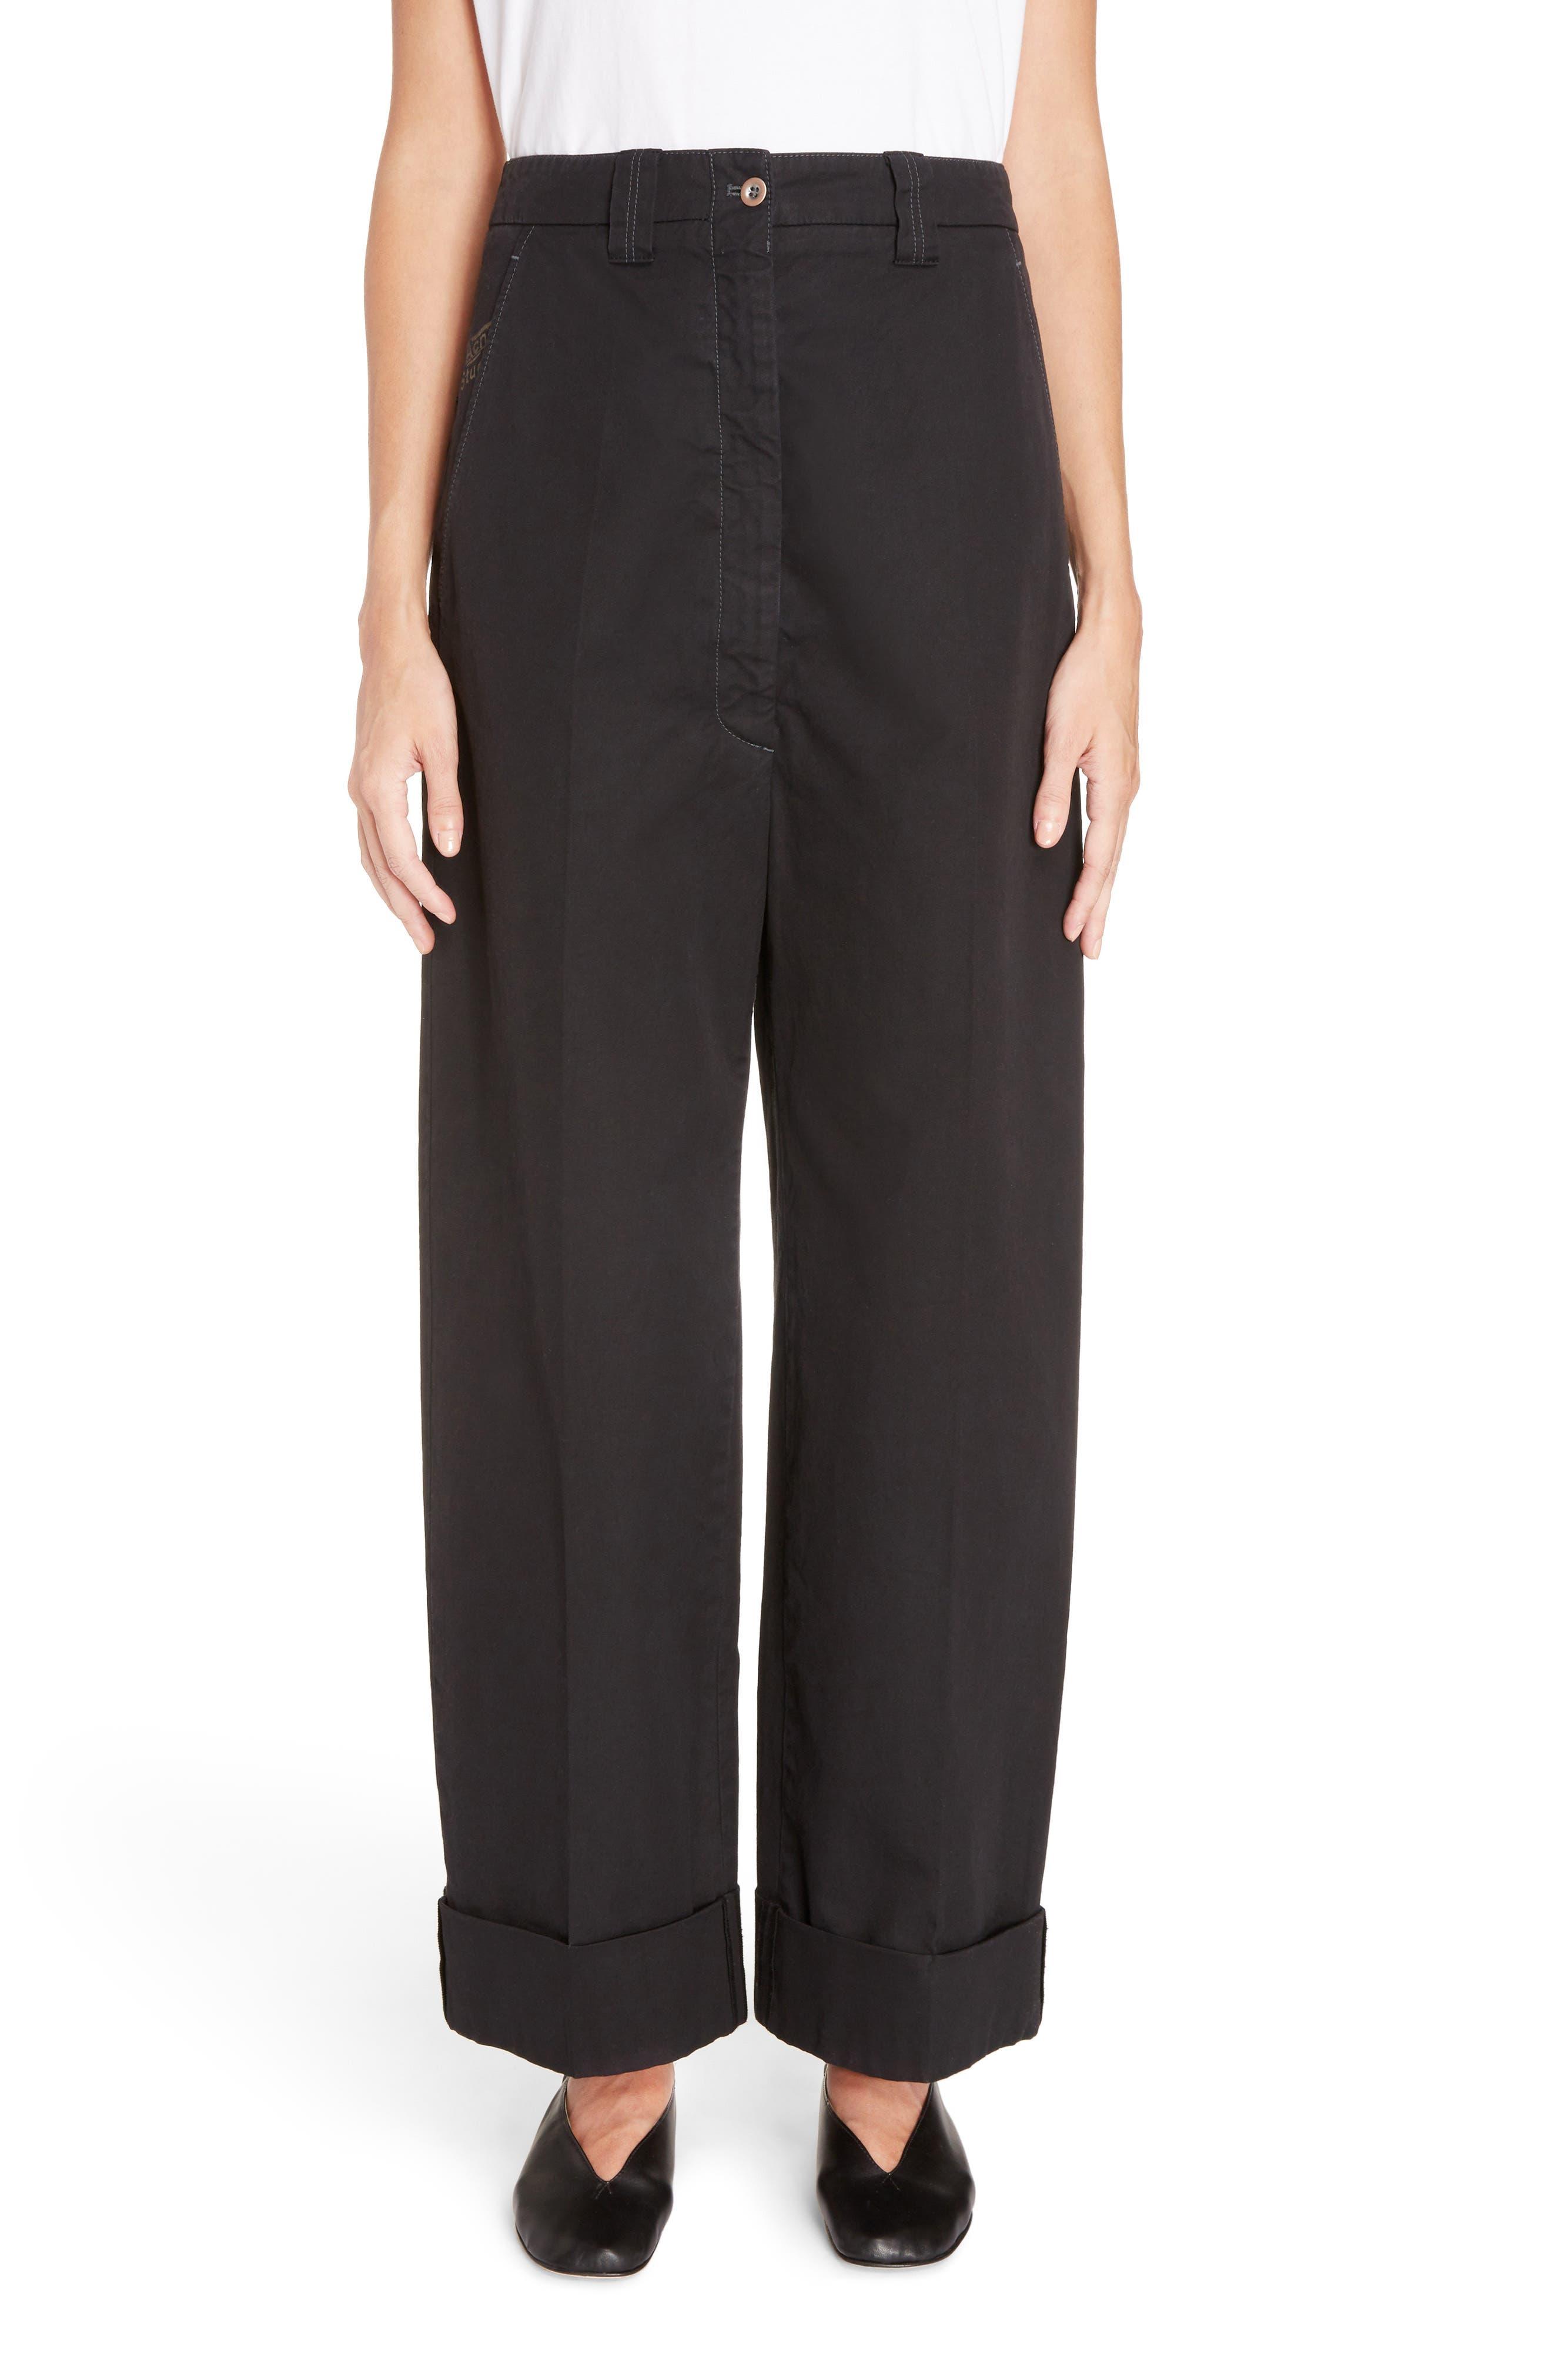 Acne Studios Madya Cuffed Cotton Pants